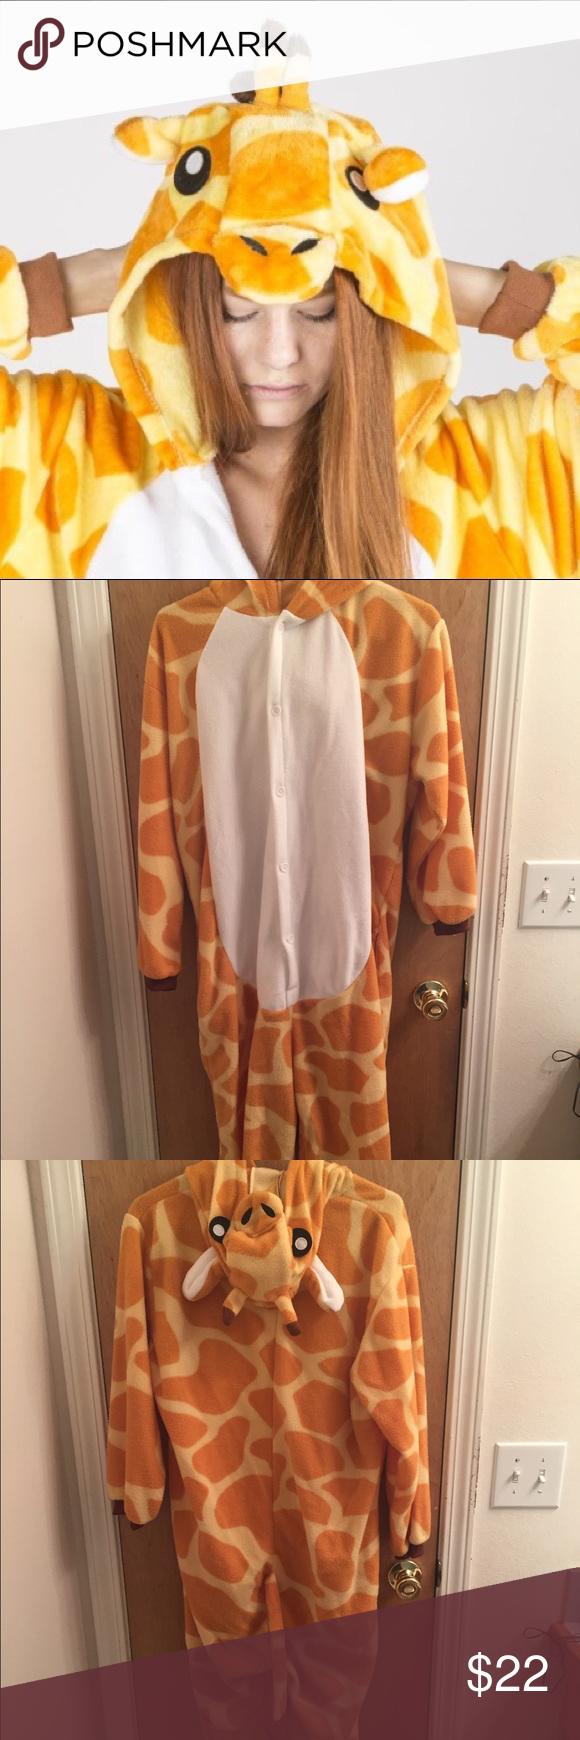 Giraffe Adult Onesie Pajamas Cute, soft, giraffe adult